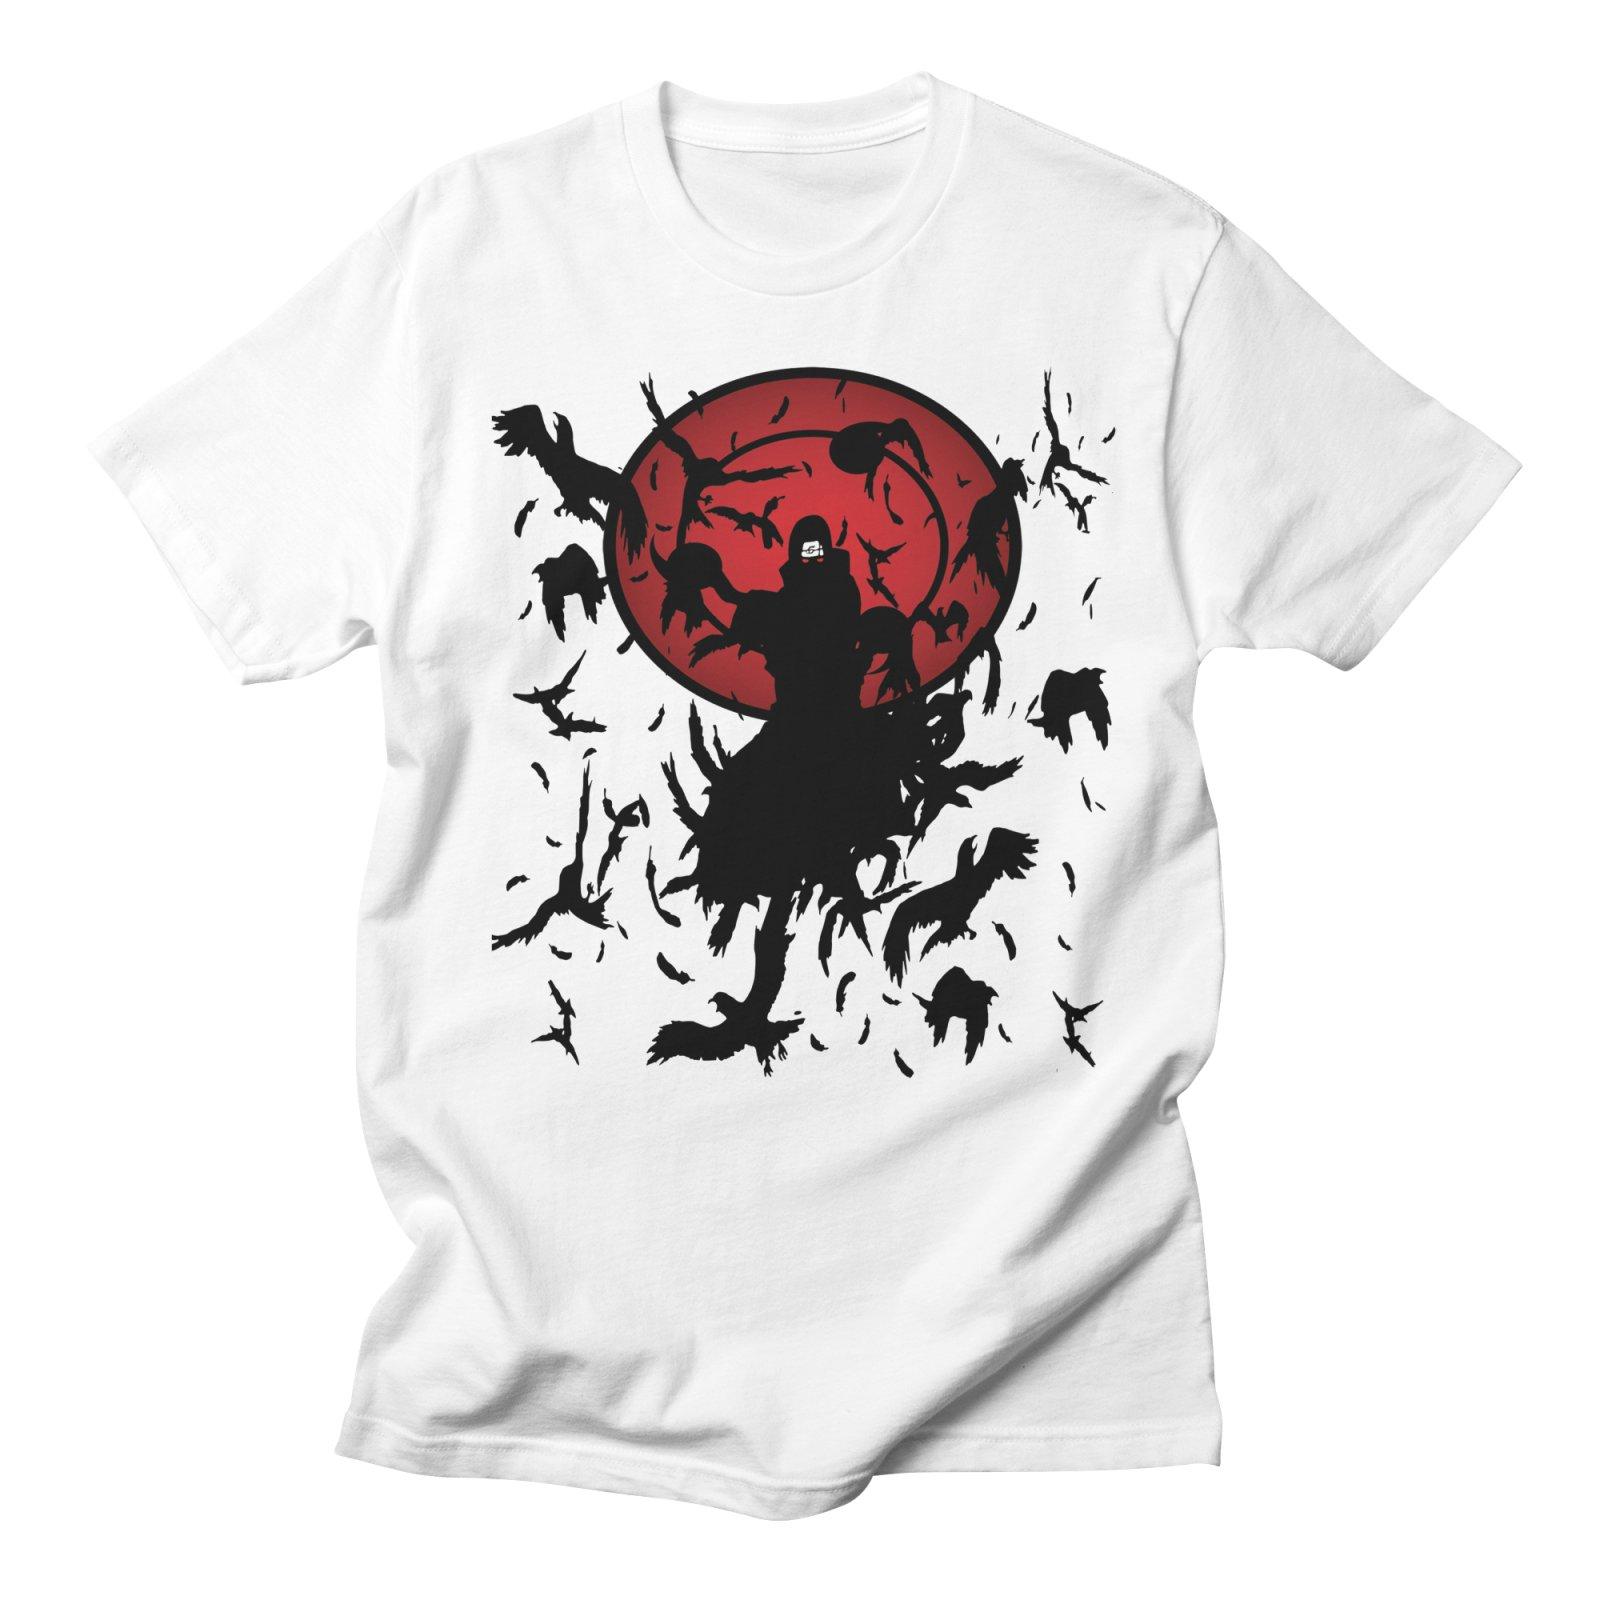 Naruto Uchiha Itachi Anime Tshirts Fashion Men Streetwear Harajuku Casual Cotton Creative Plus Size White T shirt Men Clothes